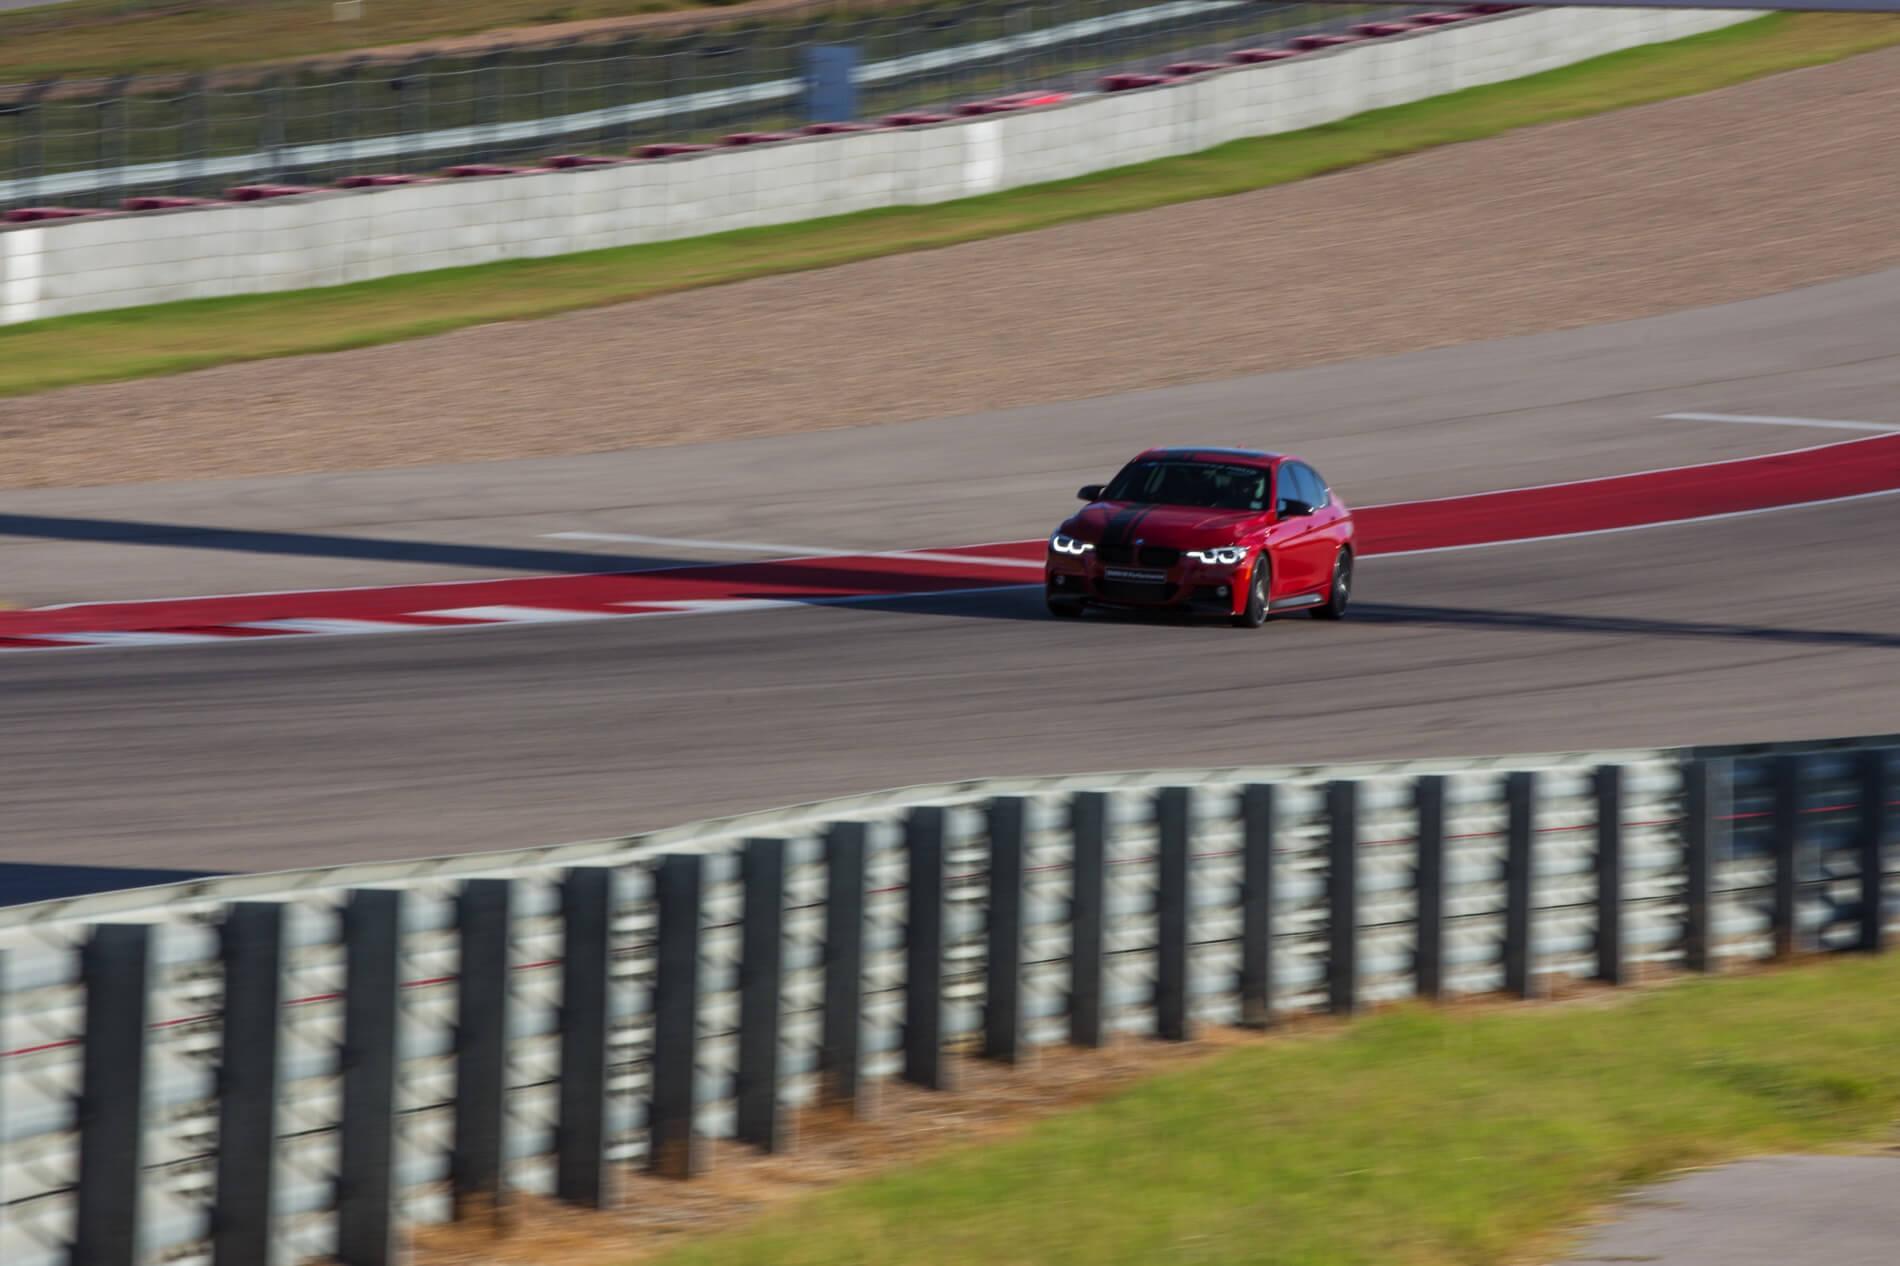 BMW-M-Track-Days-Austin-2017-83 (1).jpg